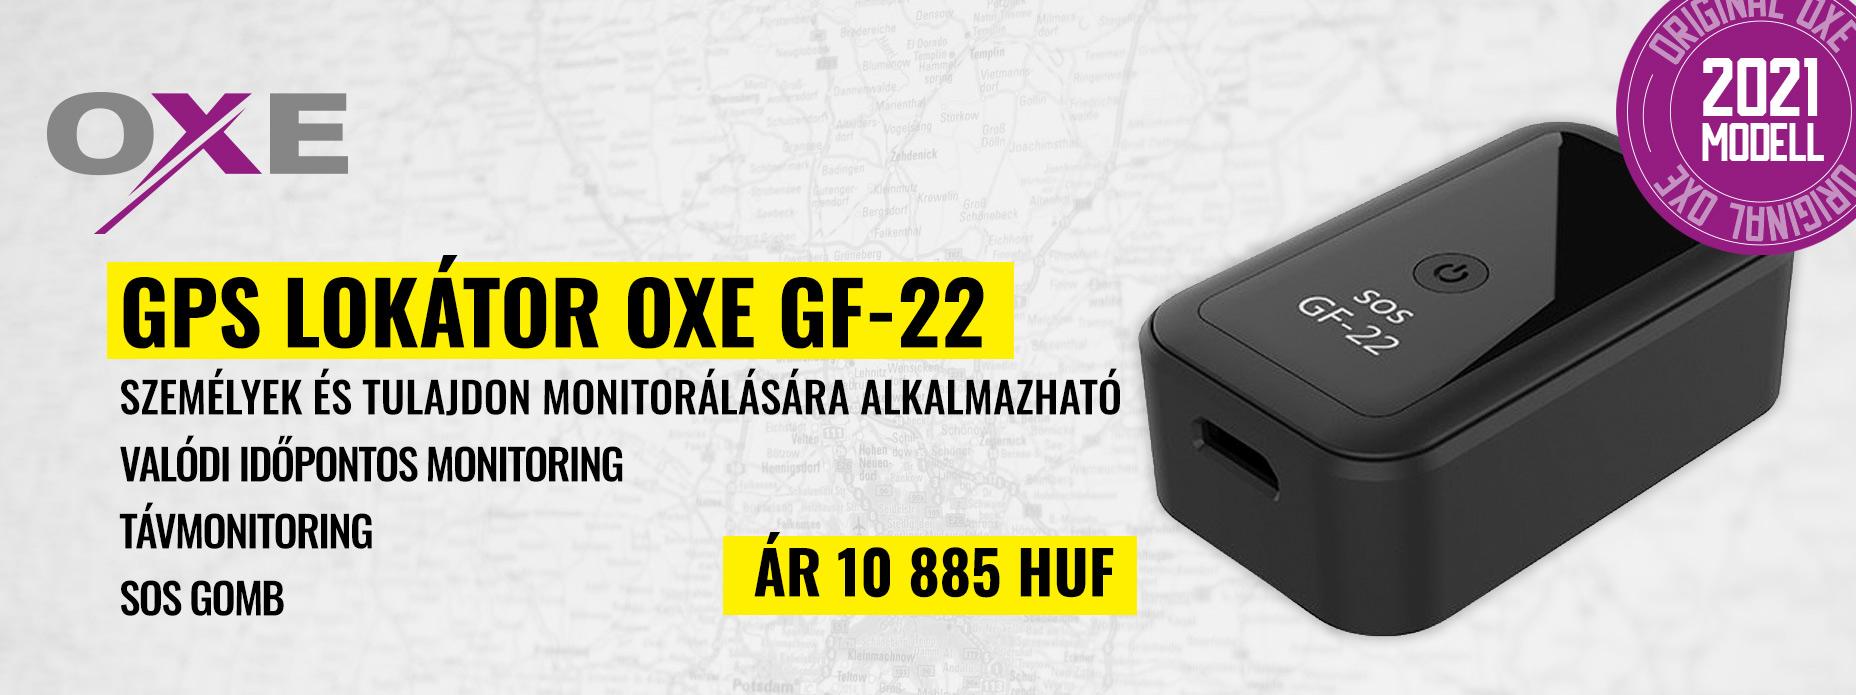 GPS lokátor OXE GF-22